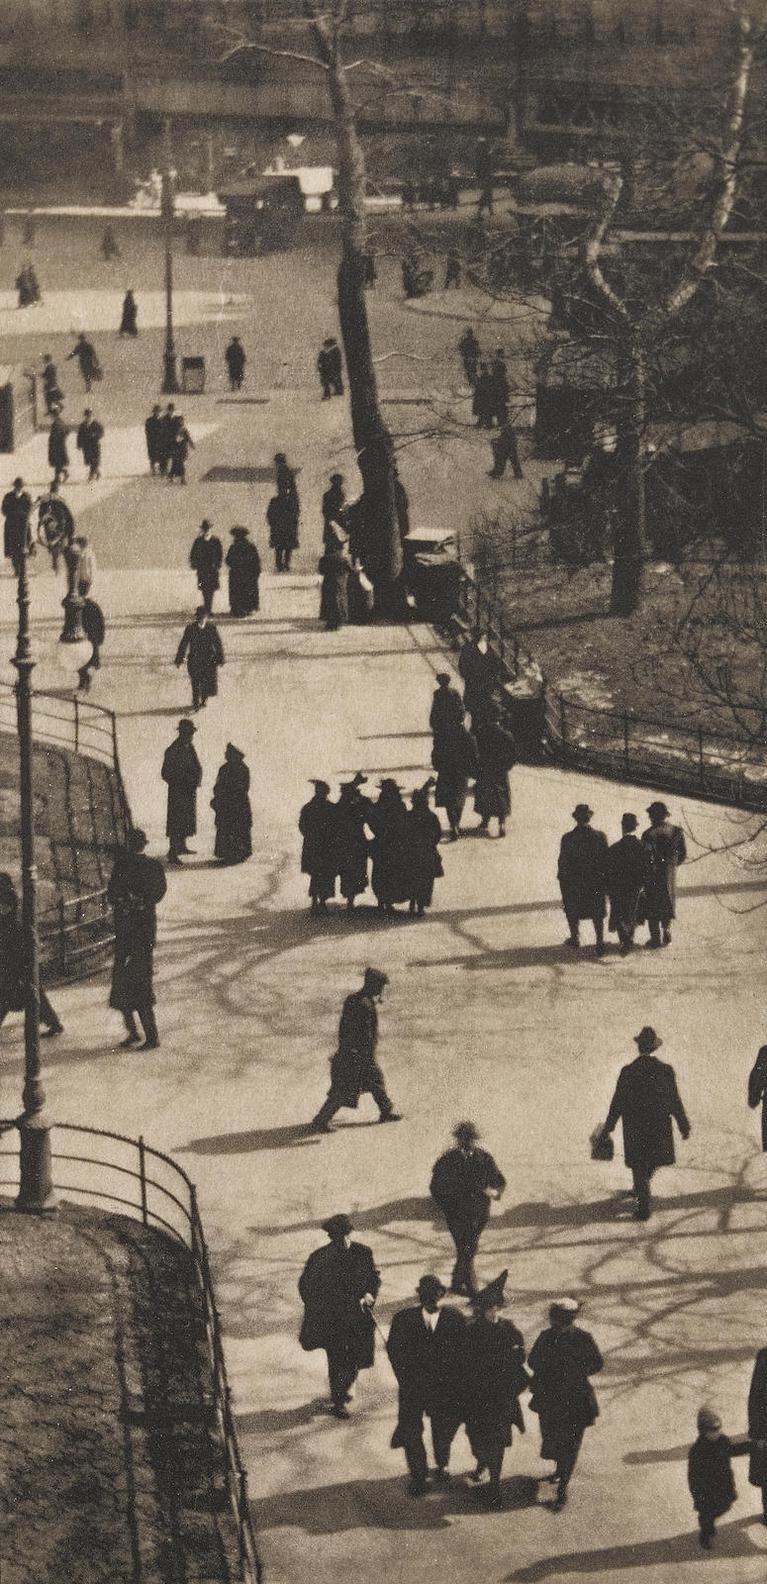 Paul Strand-New York-1916